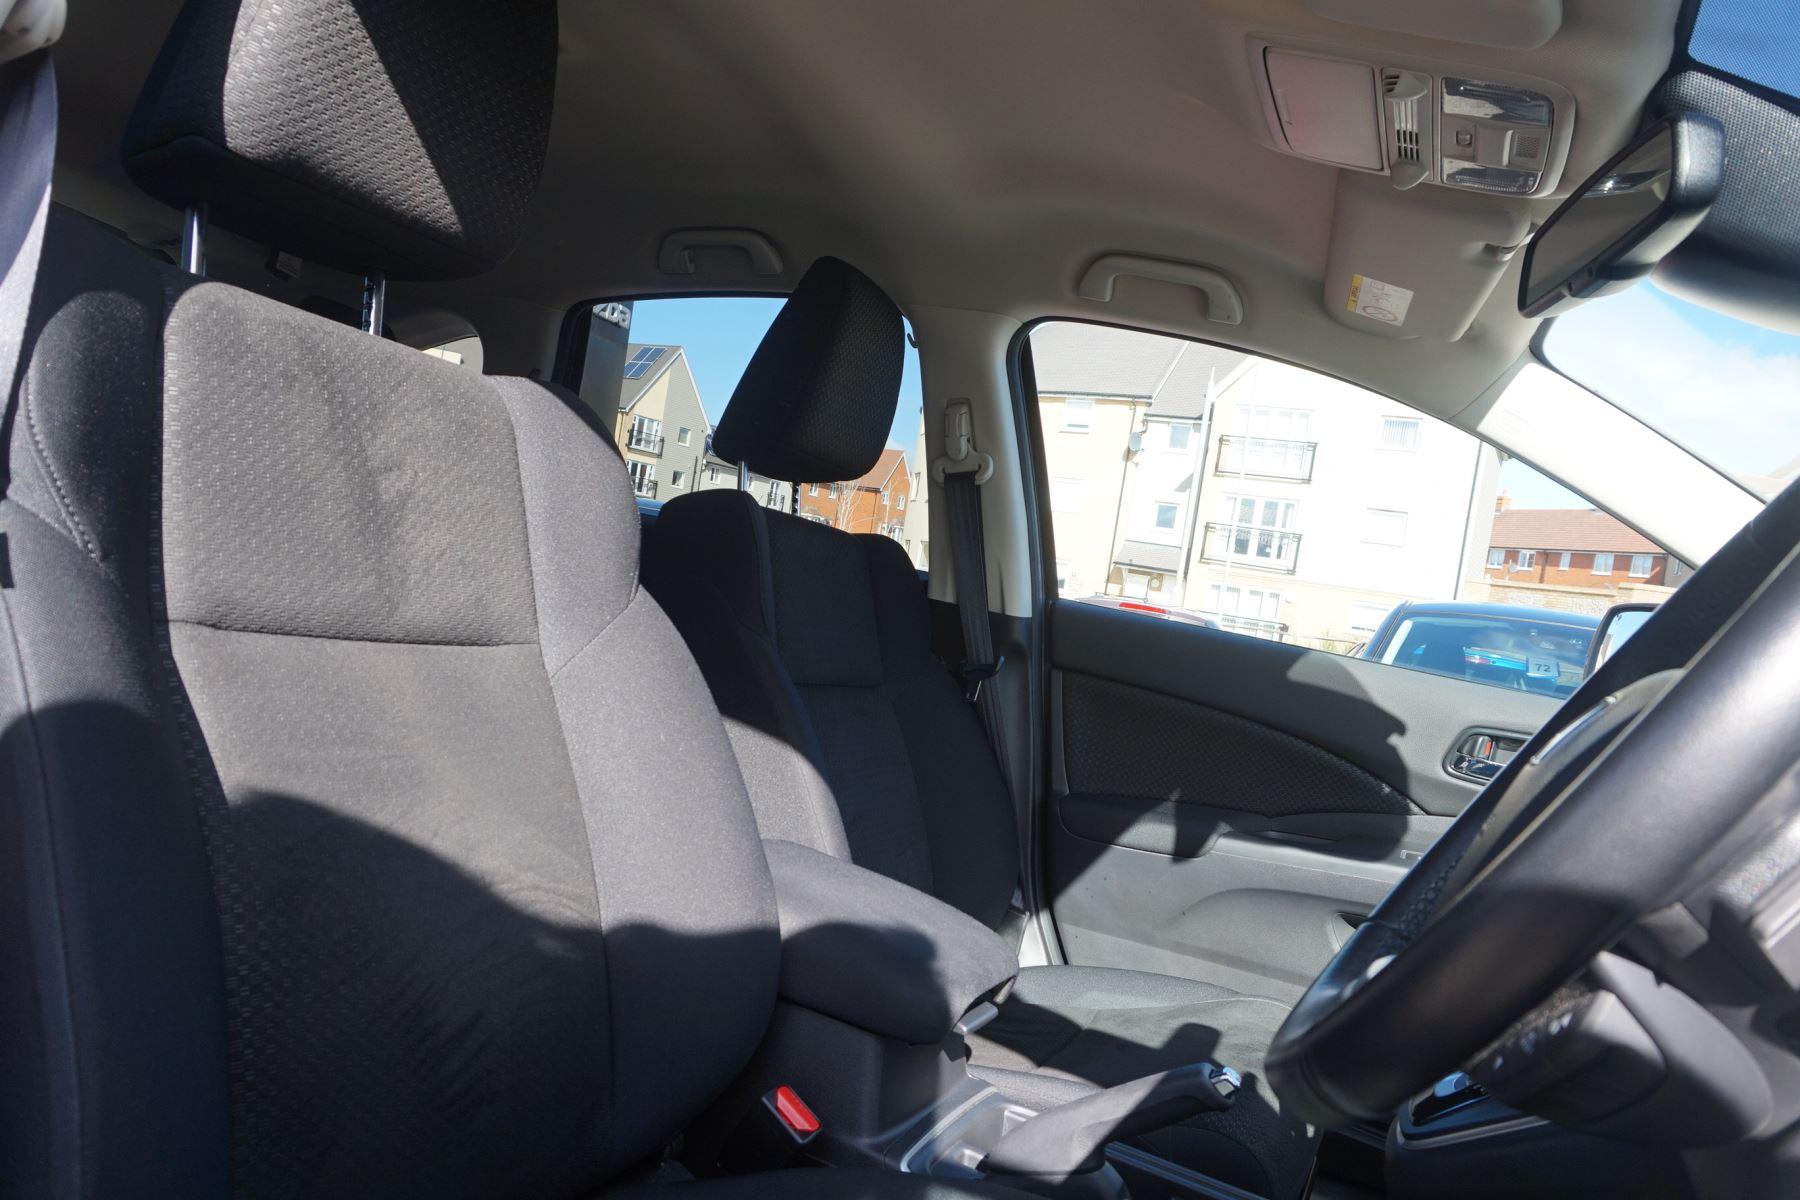 Honda CR-V 1.6 i-DTEC 160 SE Plus 5dr [Nav] 4WD image 20